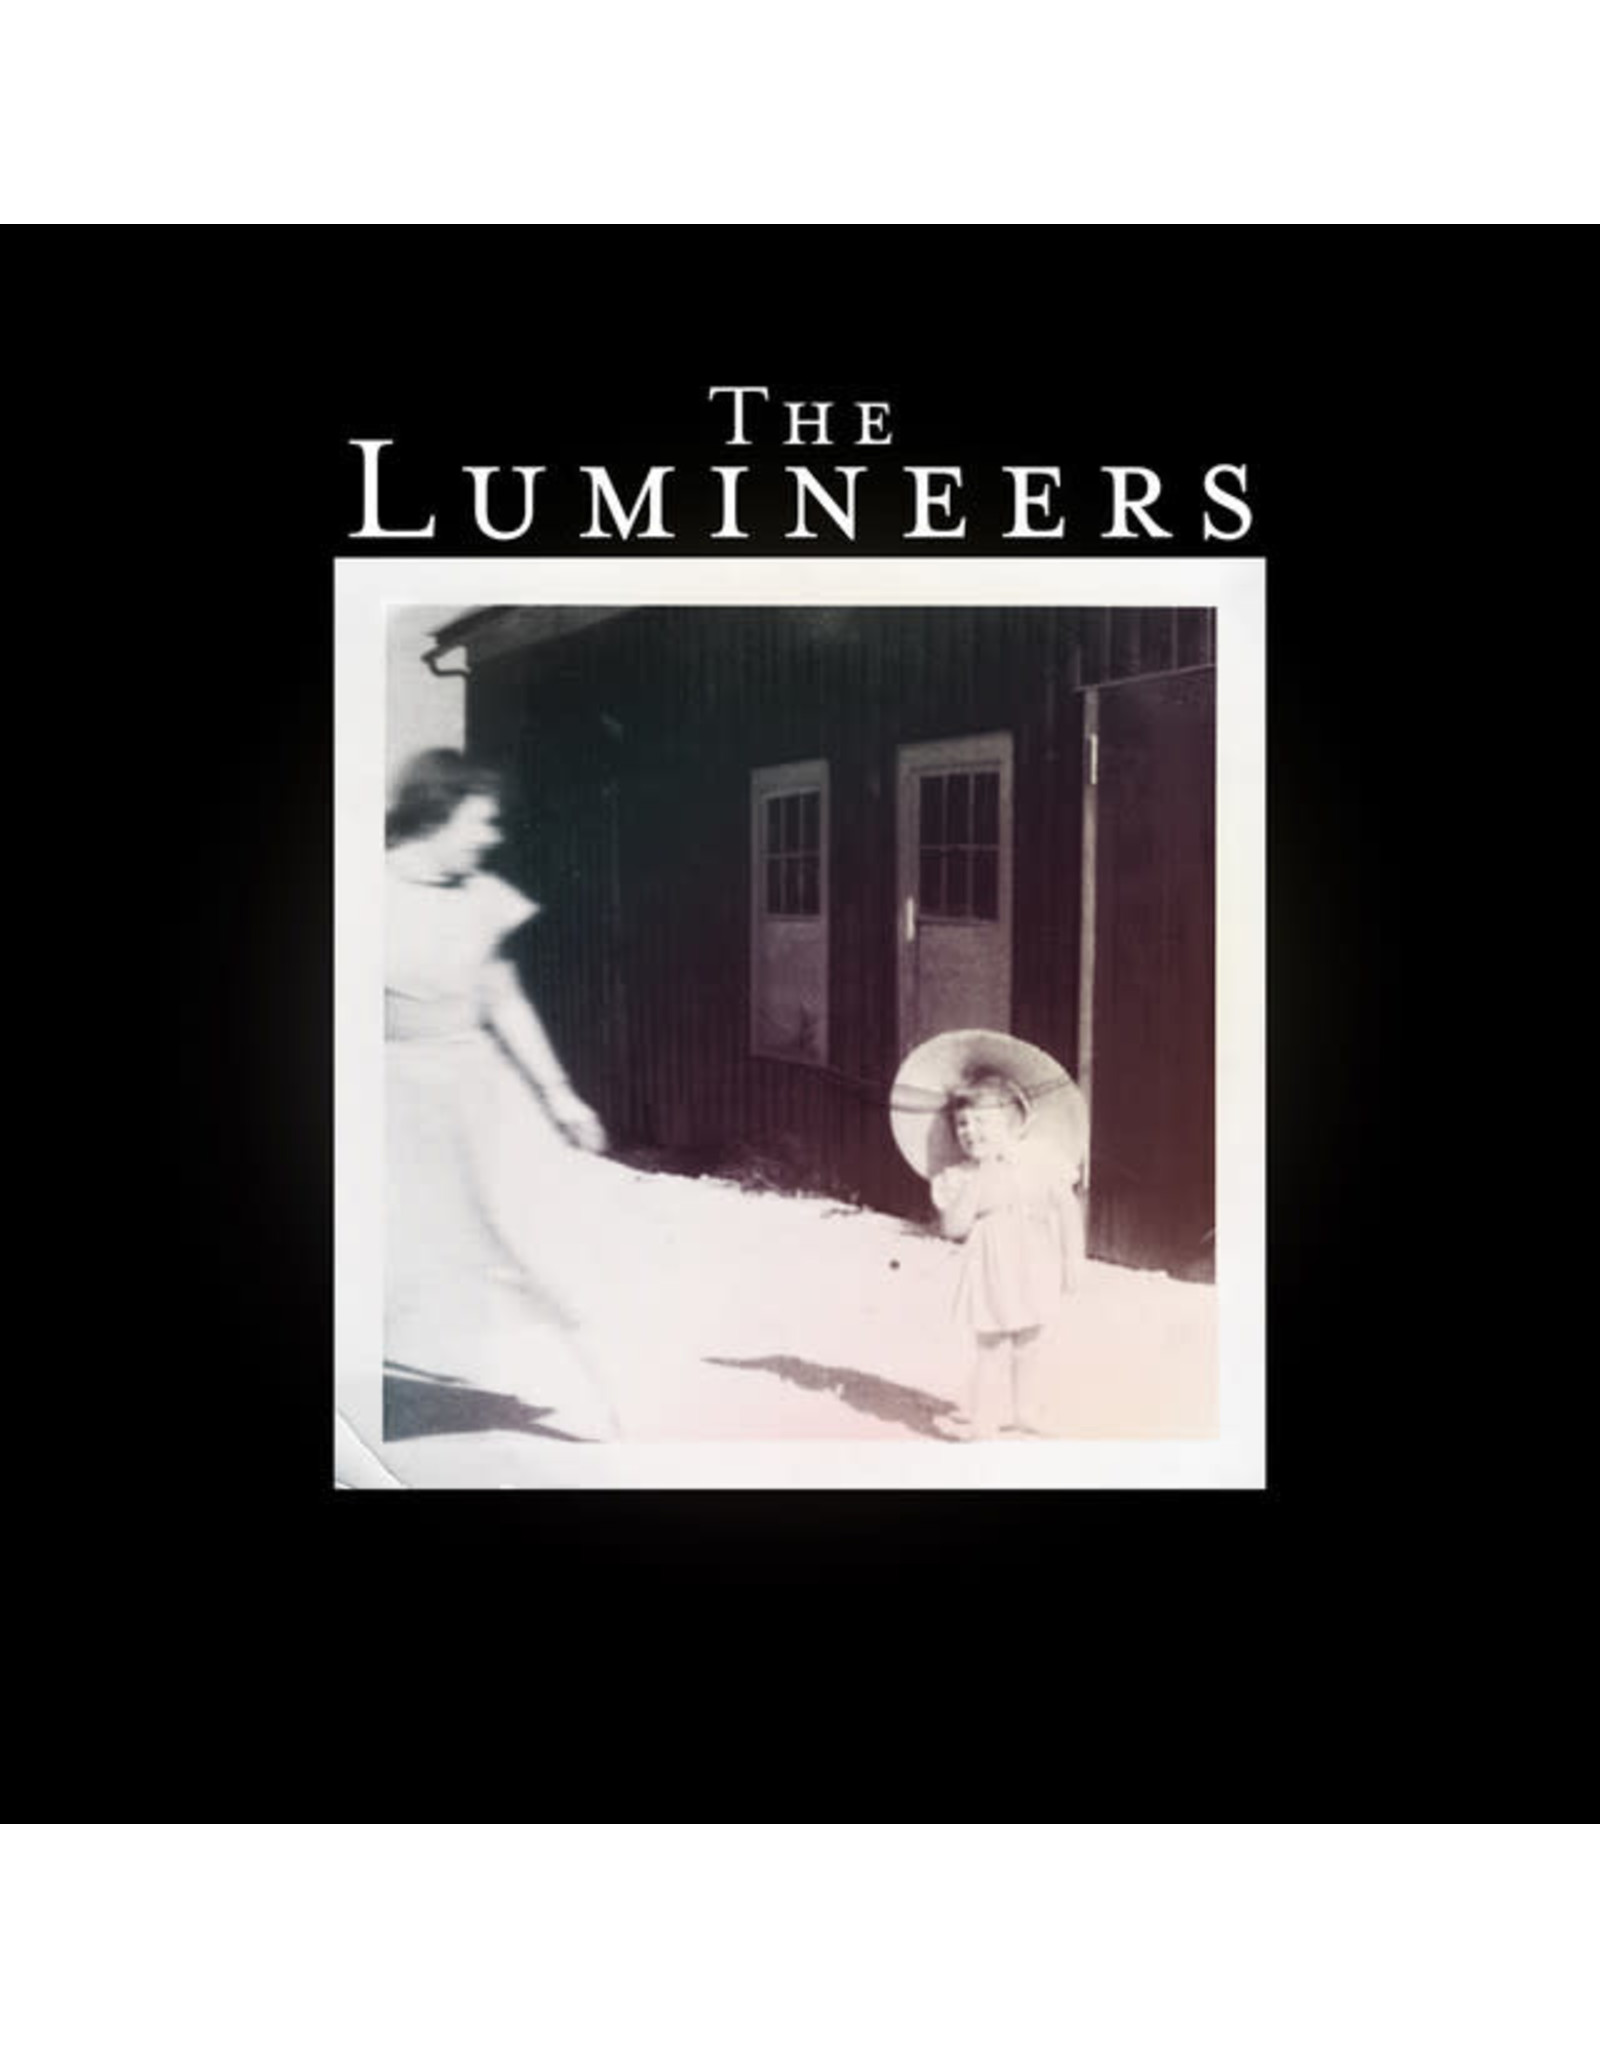 Vinyl The Lumineers - ST